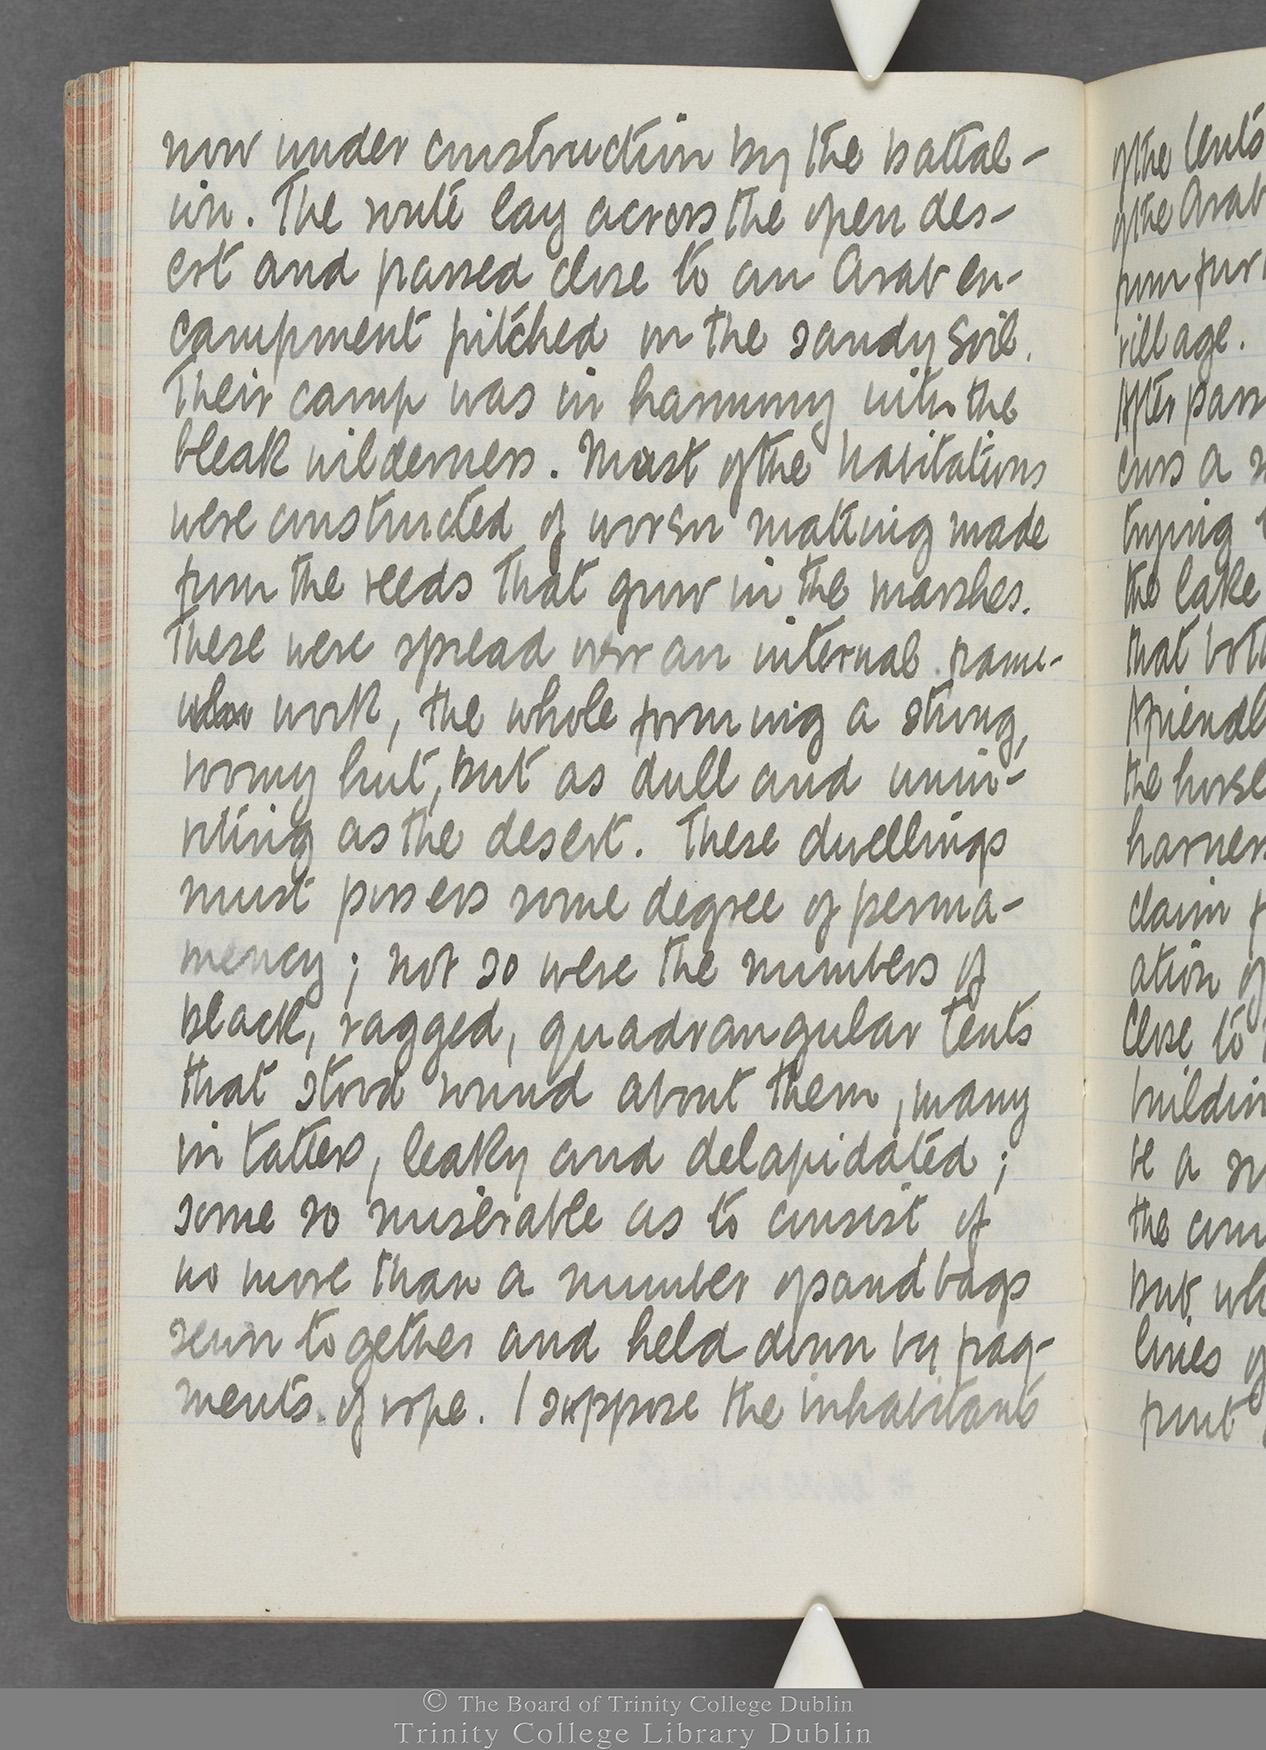 TCD MS 10515 folio 32v